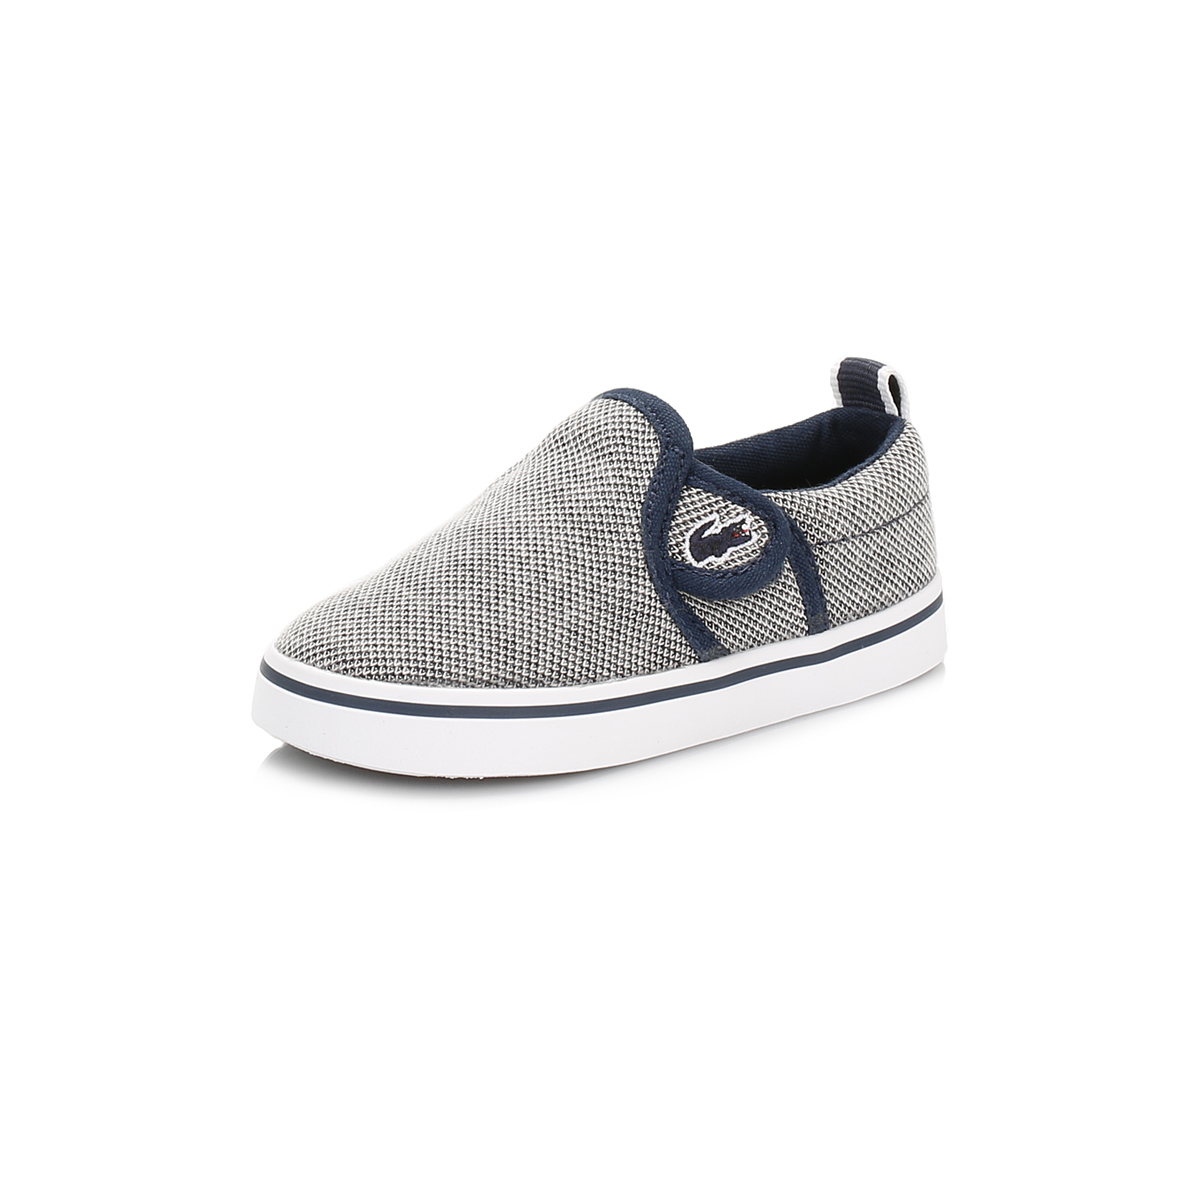 Lacoste Infants Trainers Navy Blue Gazon Slip On Hook & Loop Canvas Sport Shoes